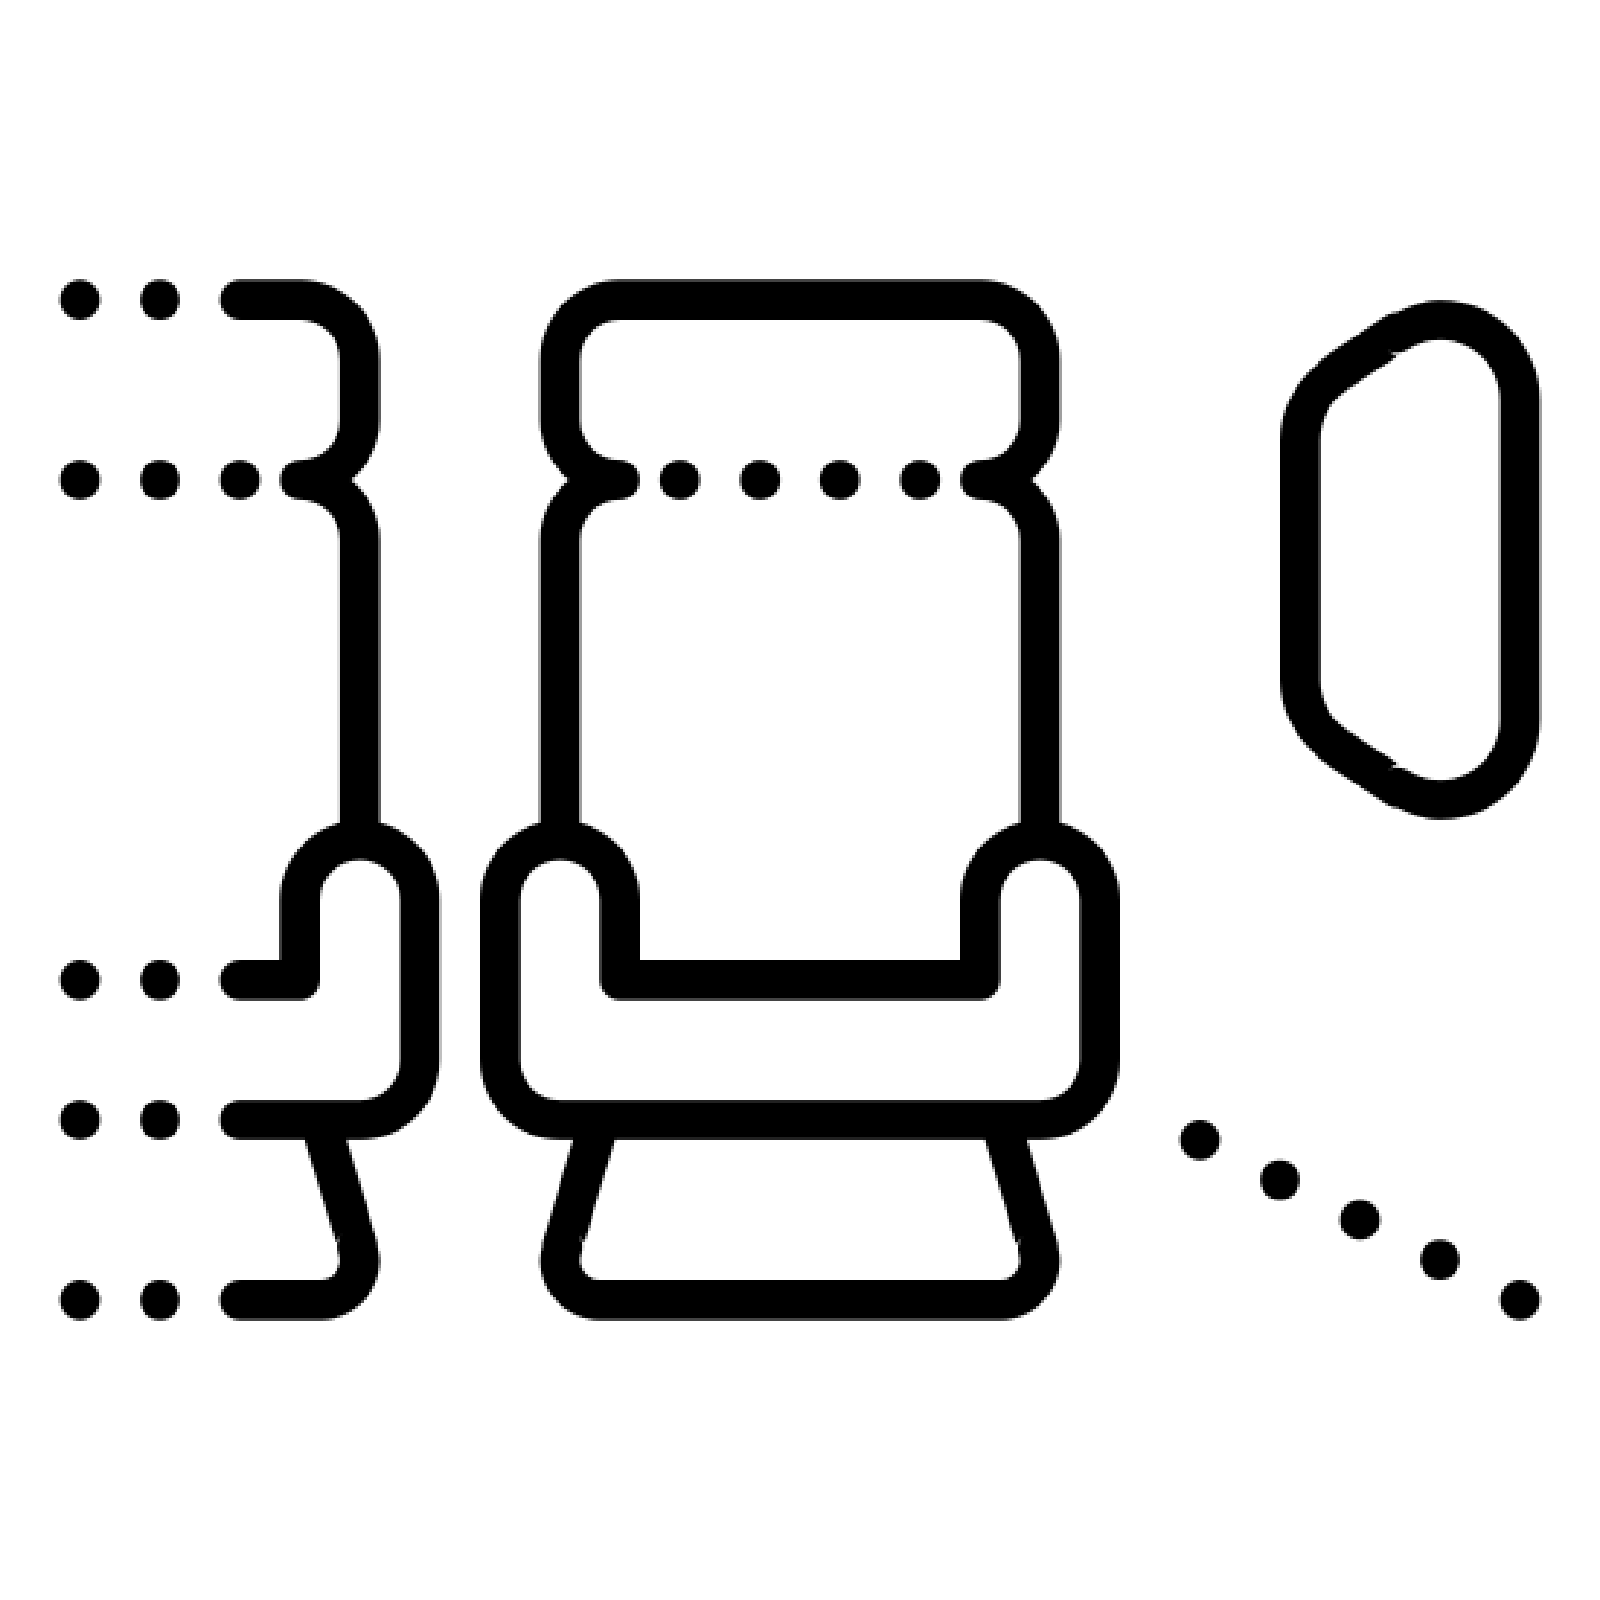 Aircraft Seat Window icon